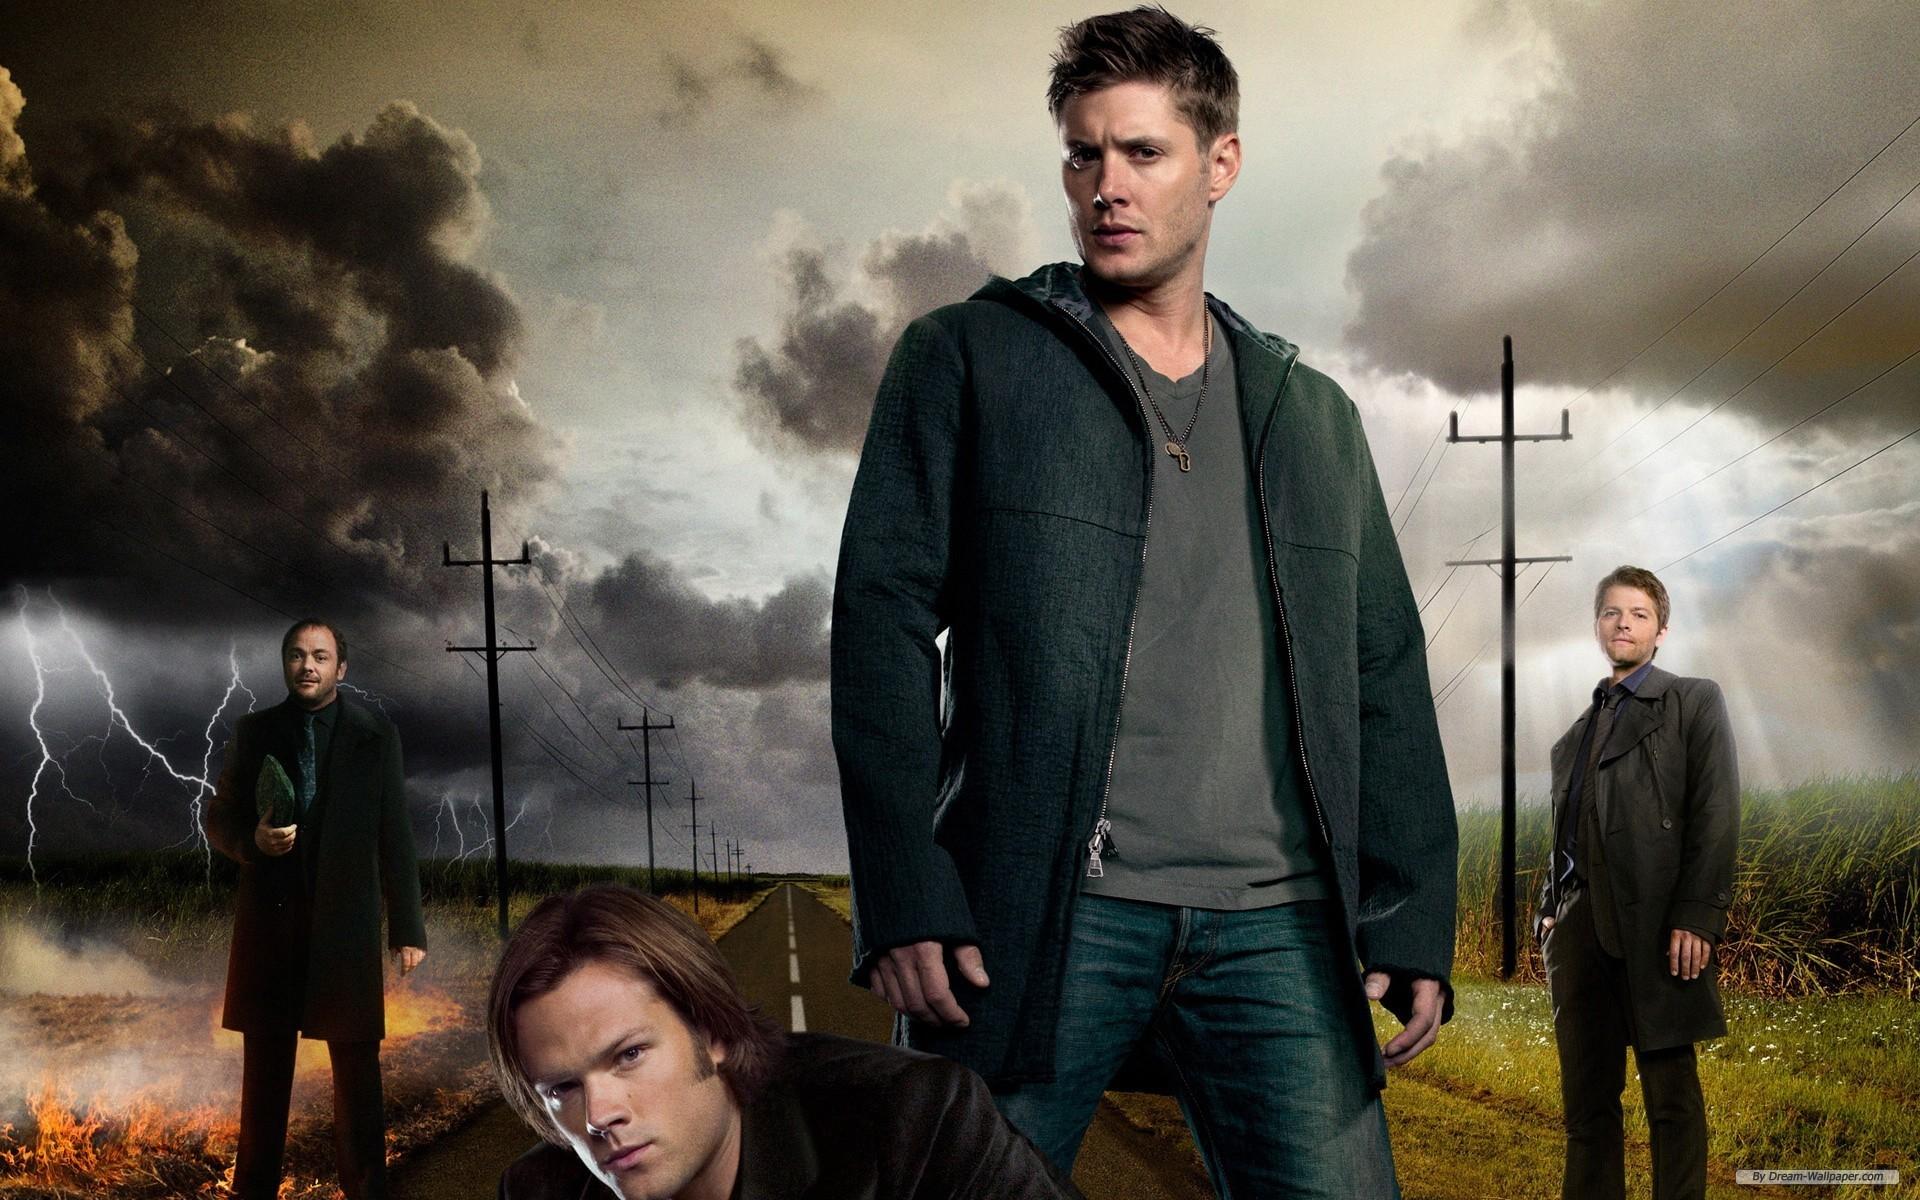 Supernatural Season 8 wallpaper – wallpaper – Index 11 .